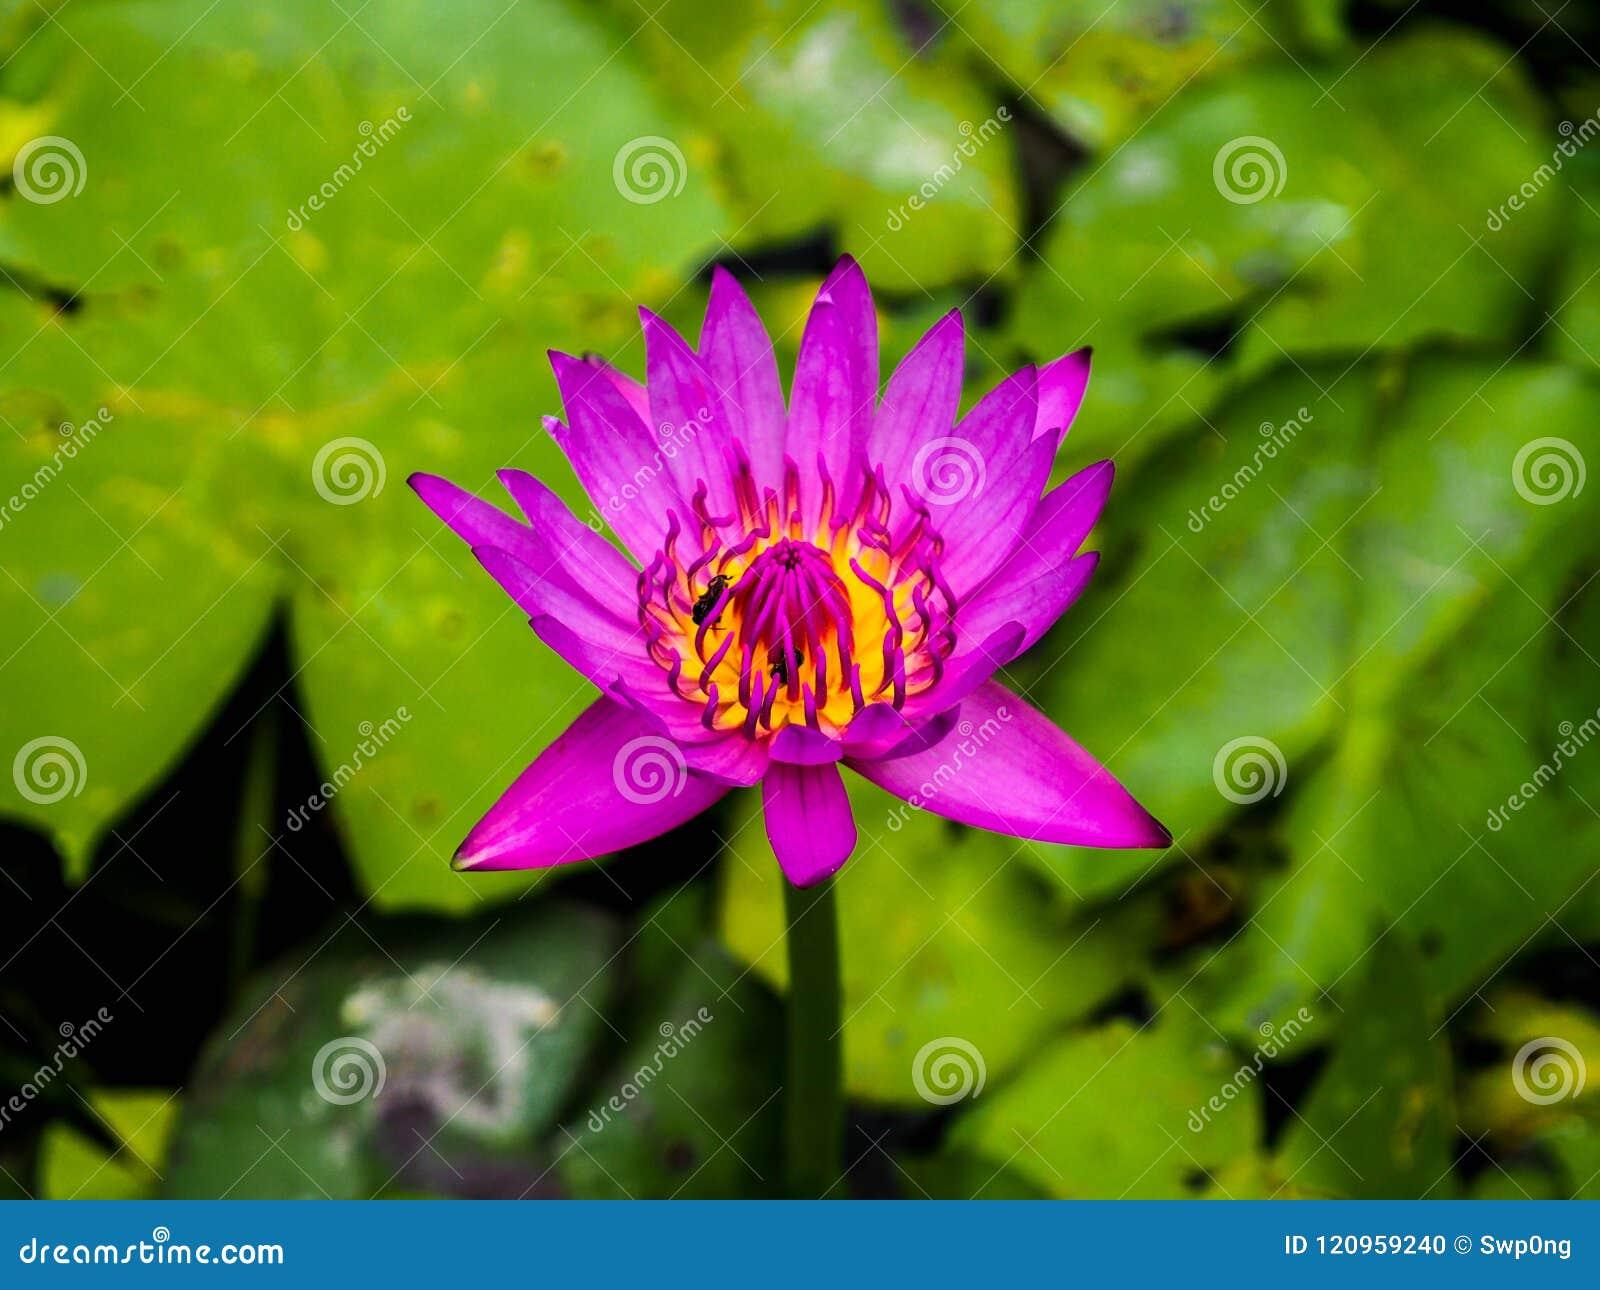 Closeup bee in pink lotus flower stock photo image of flora closeup bee in pink lotus flower mightylinksfo